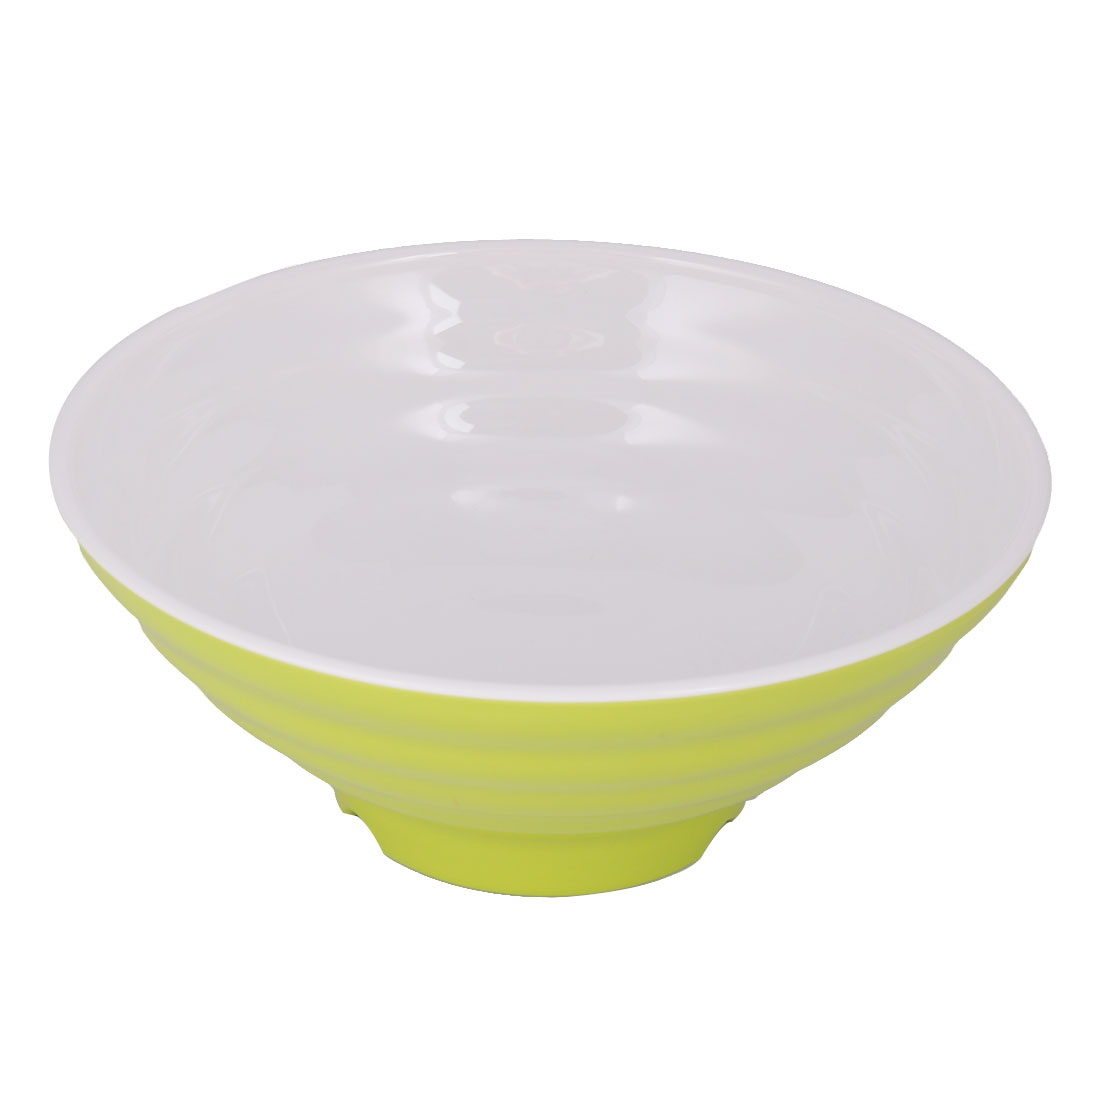 Home Kitchen Plastic Food Rice Soup Noodles Porridge Storage Container Bowl Green White